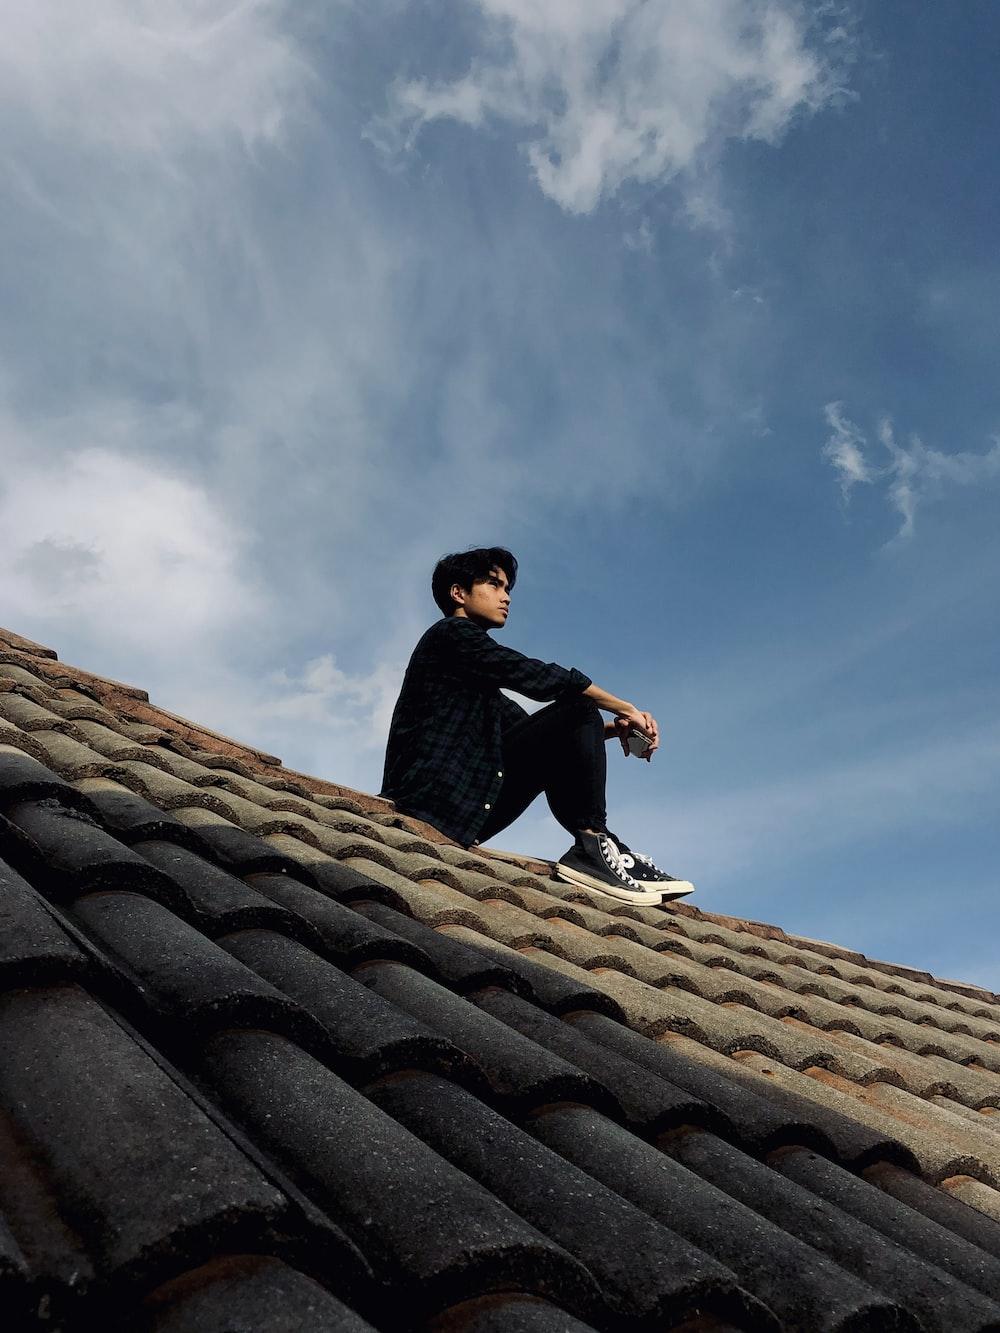 man in black jacket sitting on roof under blue sky during daytime